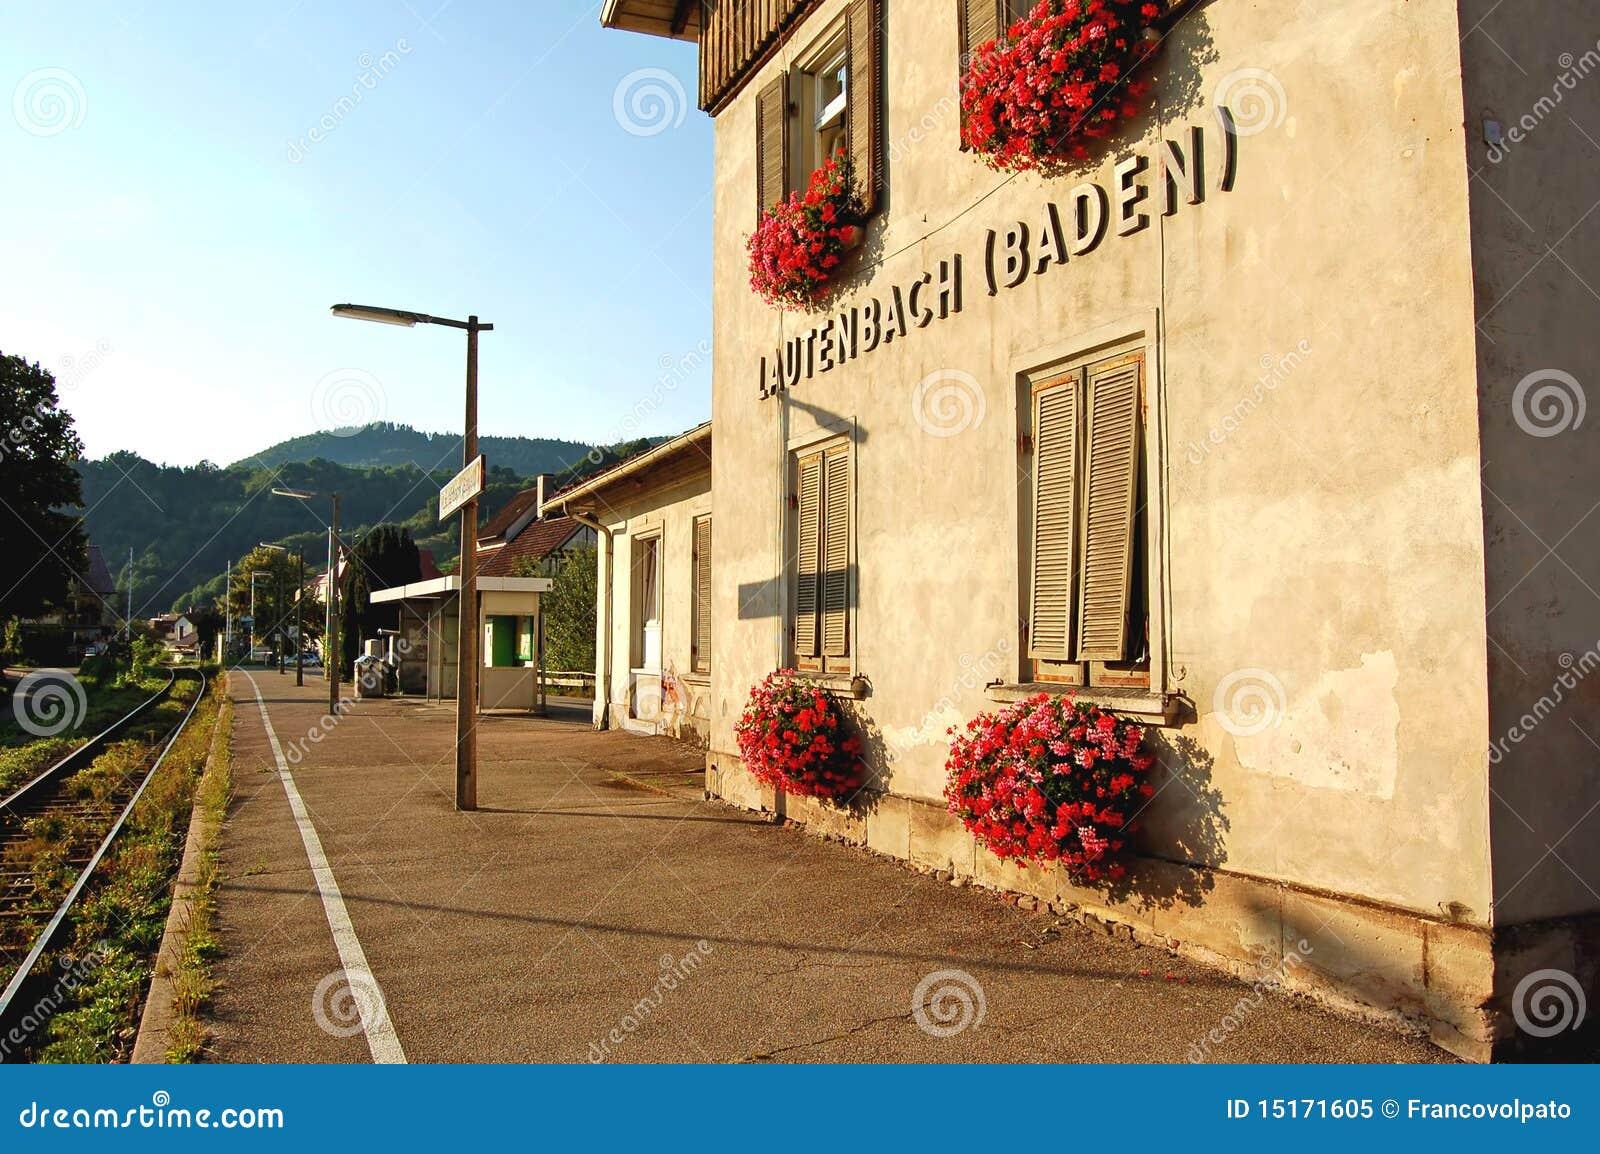 La gare lautenbach baden allemagne image stock for Baden baden allemagne maison close